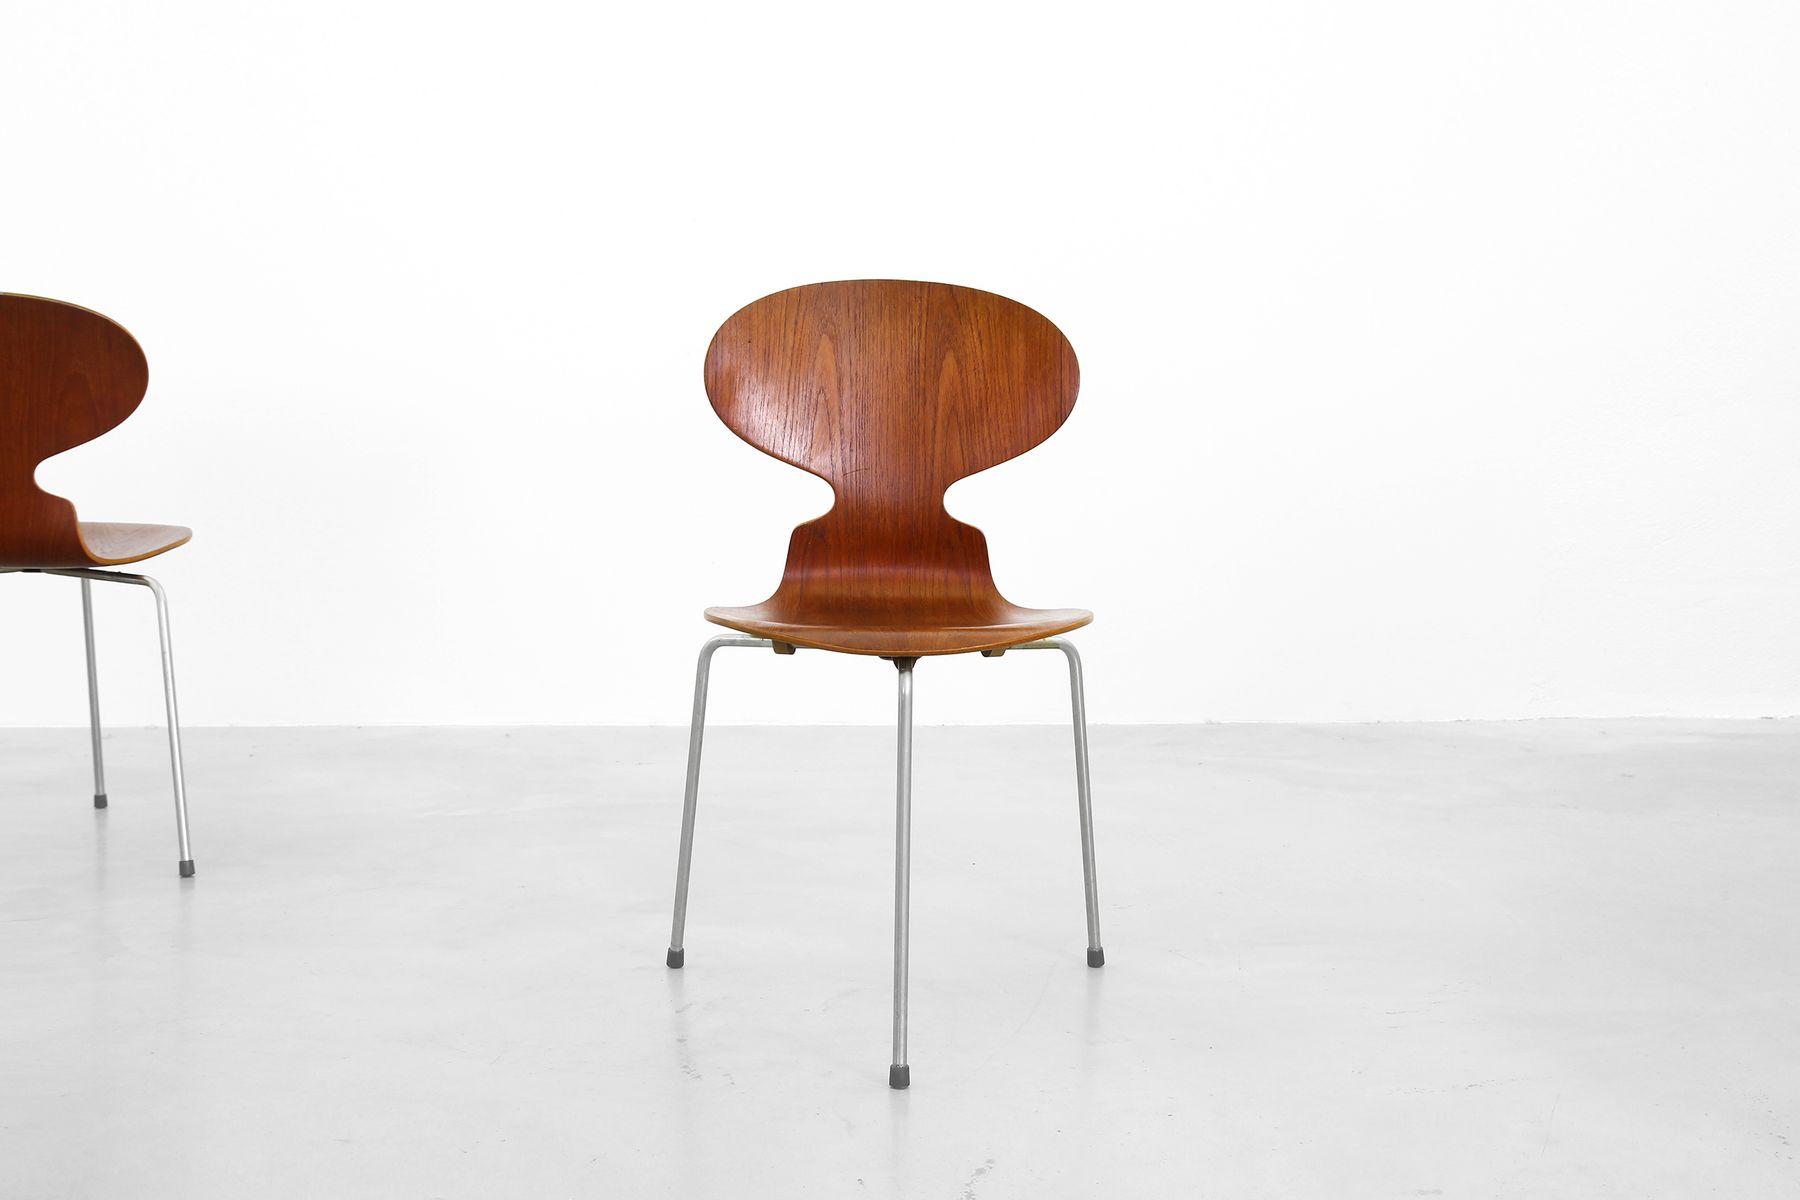 d nische mid century ant st hle von arne jacobsen f r. Black Bedroom Furniture Sets. Home Design Ideas